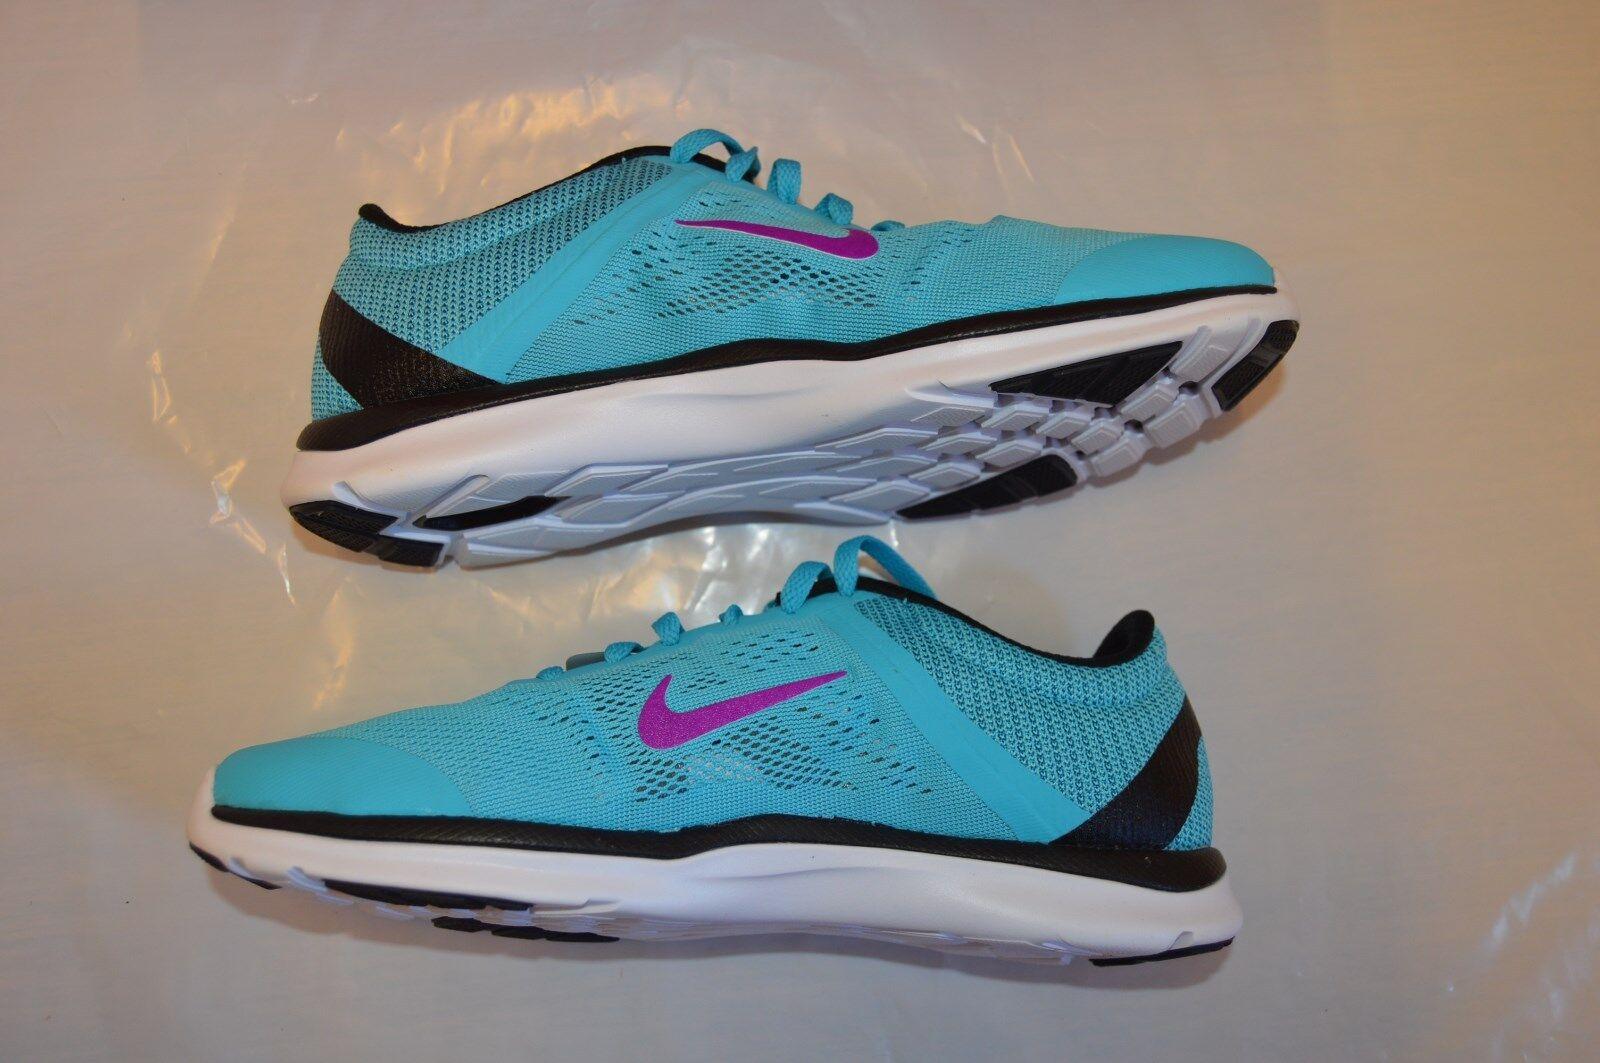 bnib femmes Nike In-Season TR / 5 Bleu / noir / TR blanc  trainers Taille5 gris abd777